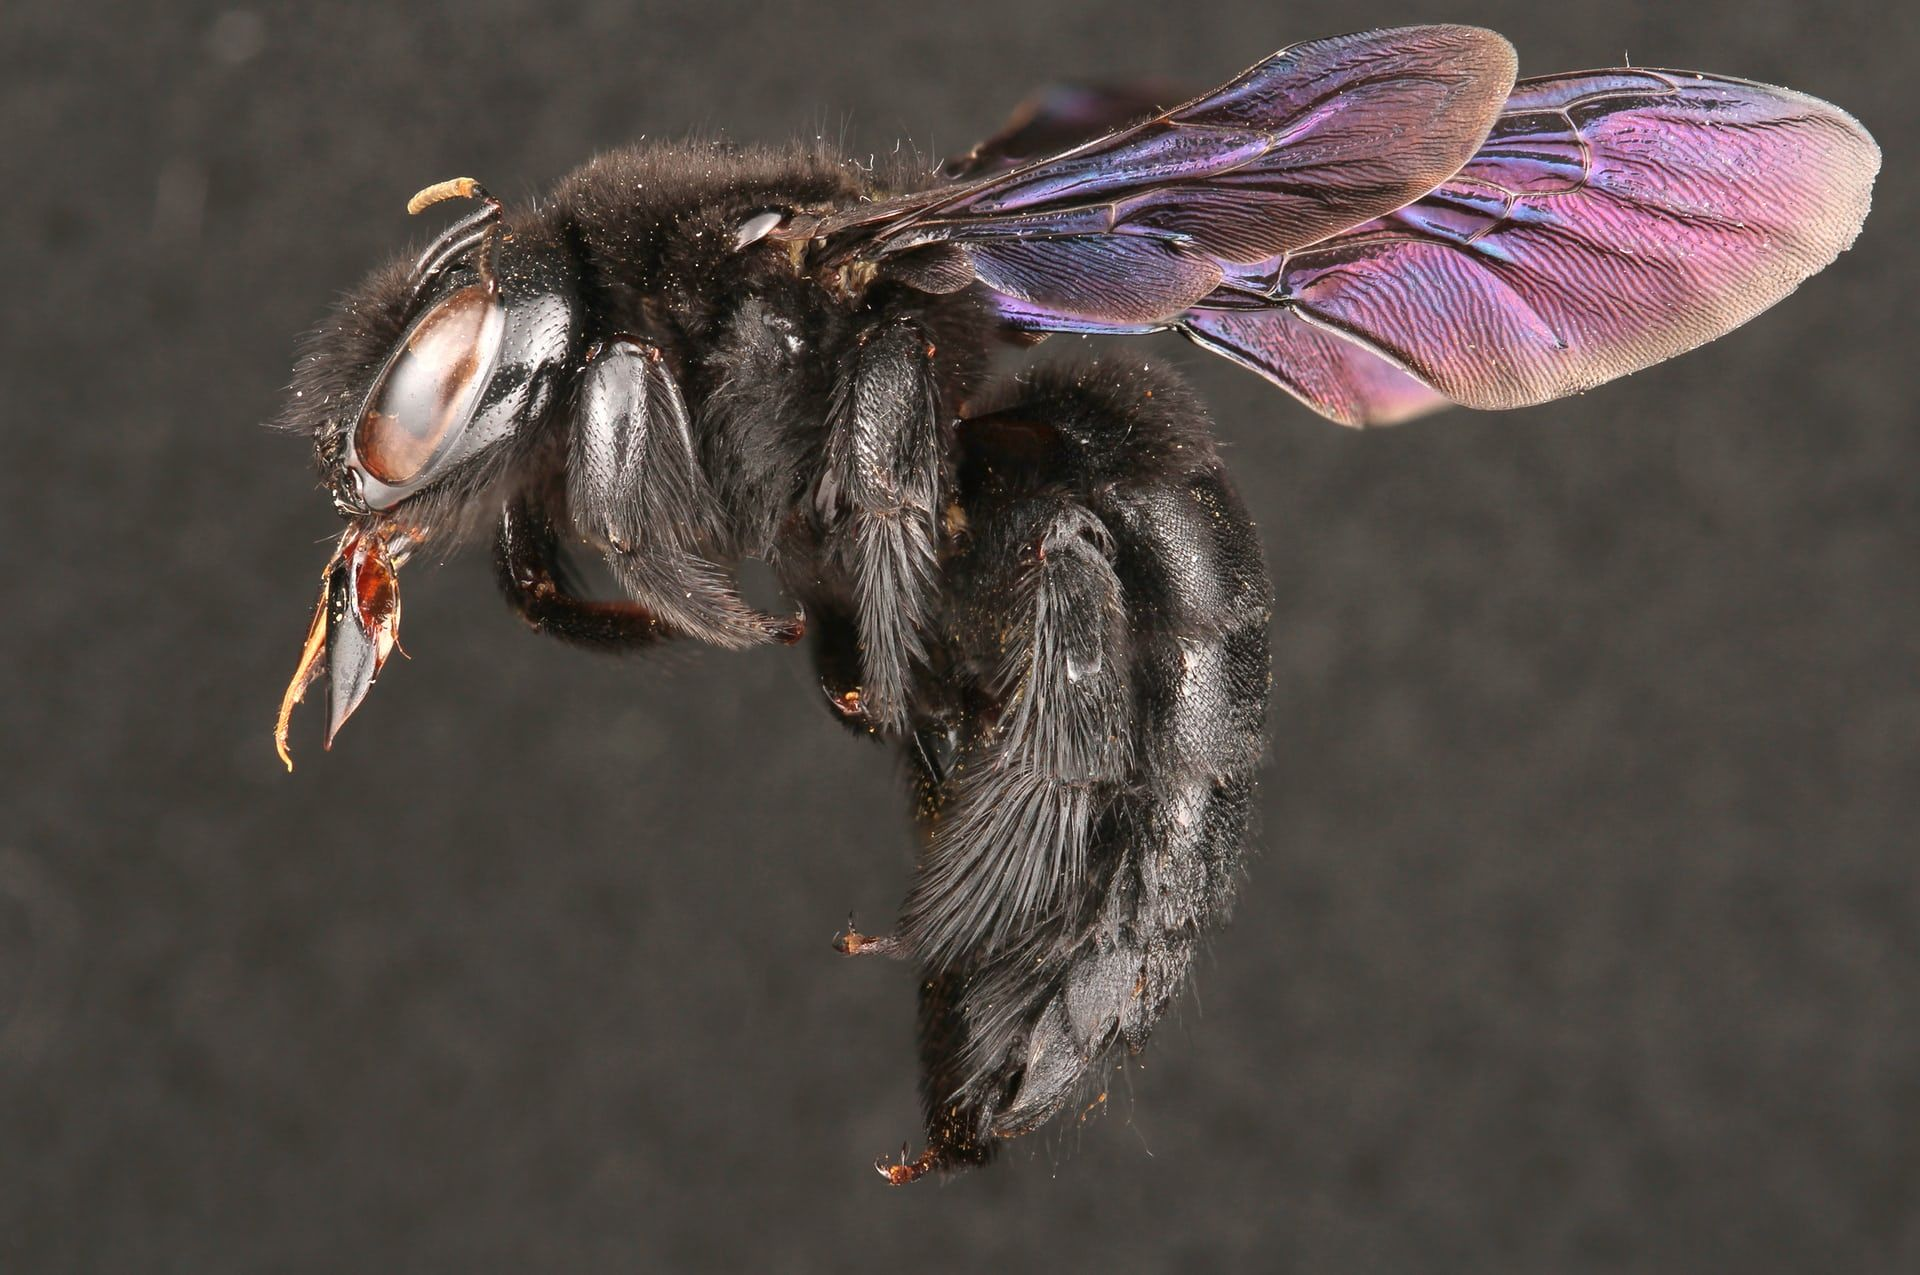 Large Female Carpenter Bee Bee Macro Lens Bee Images